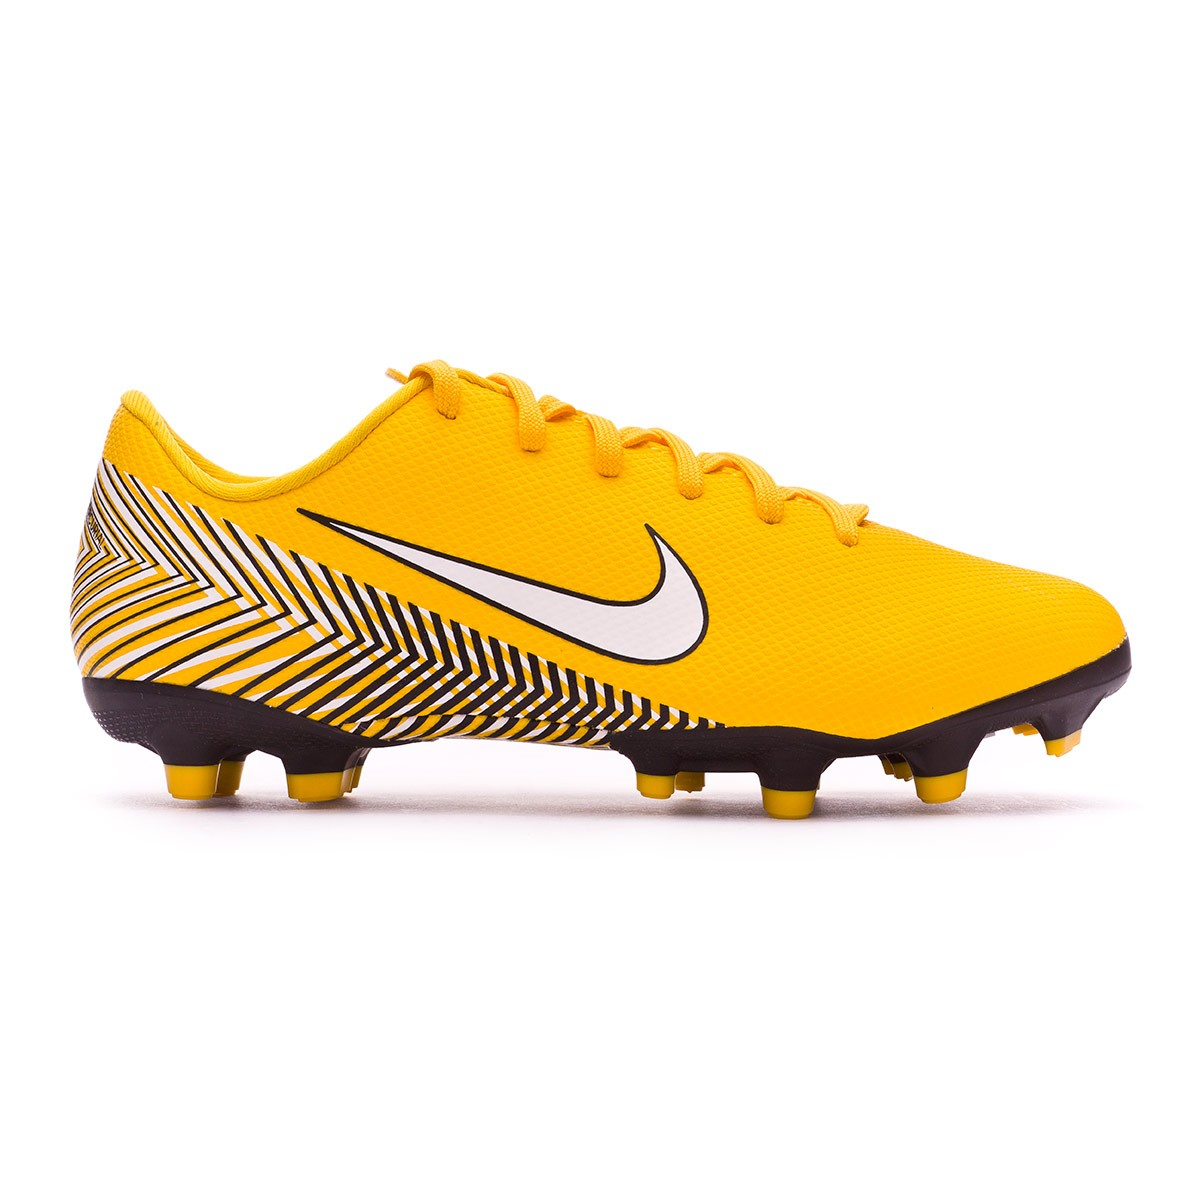 Scarpe Nike Mercurial Vapor XII Academy MG Neymar Junior Yellow-Dinamic  yellow-Black - Negozio di calcio Fútbol Emotion ad694da20a2